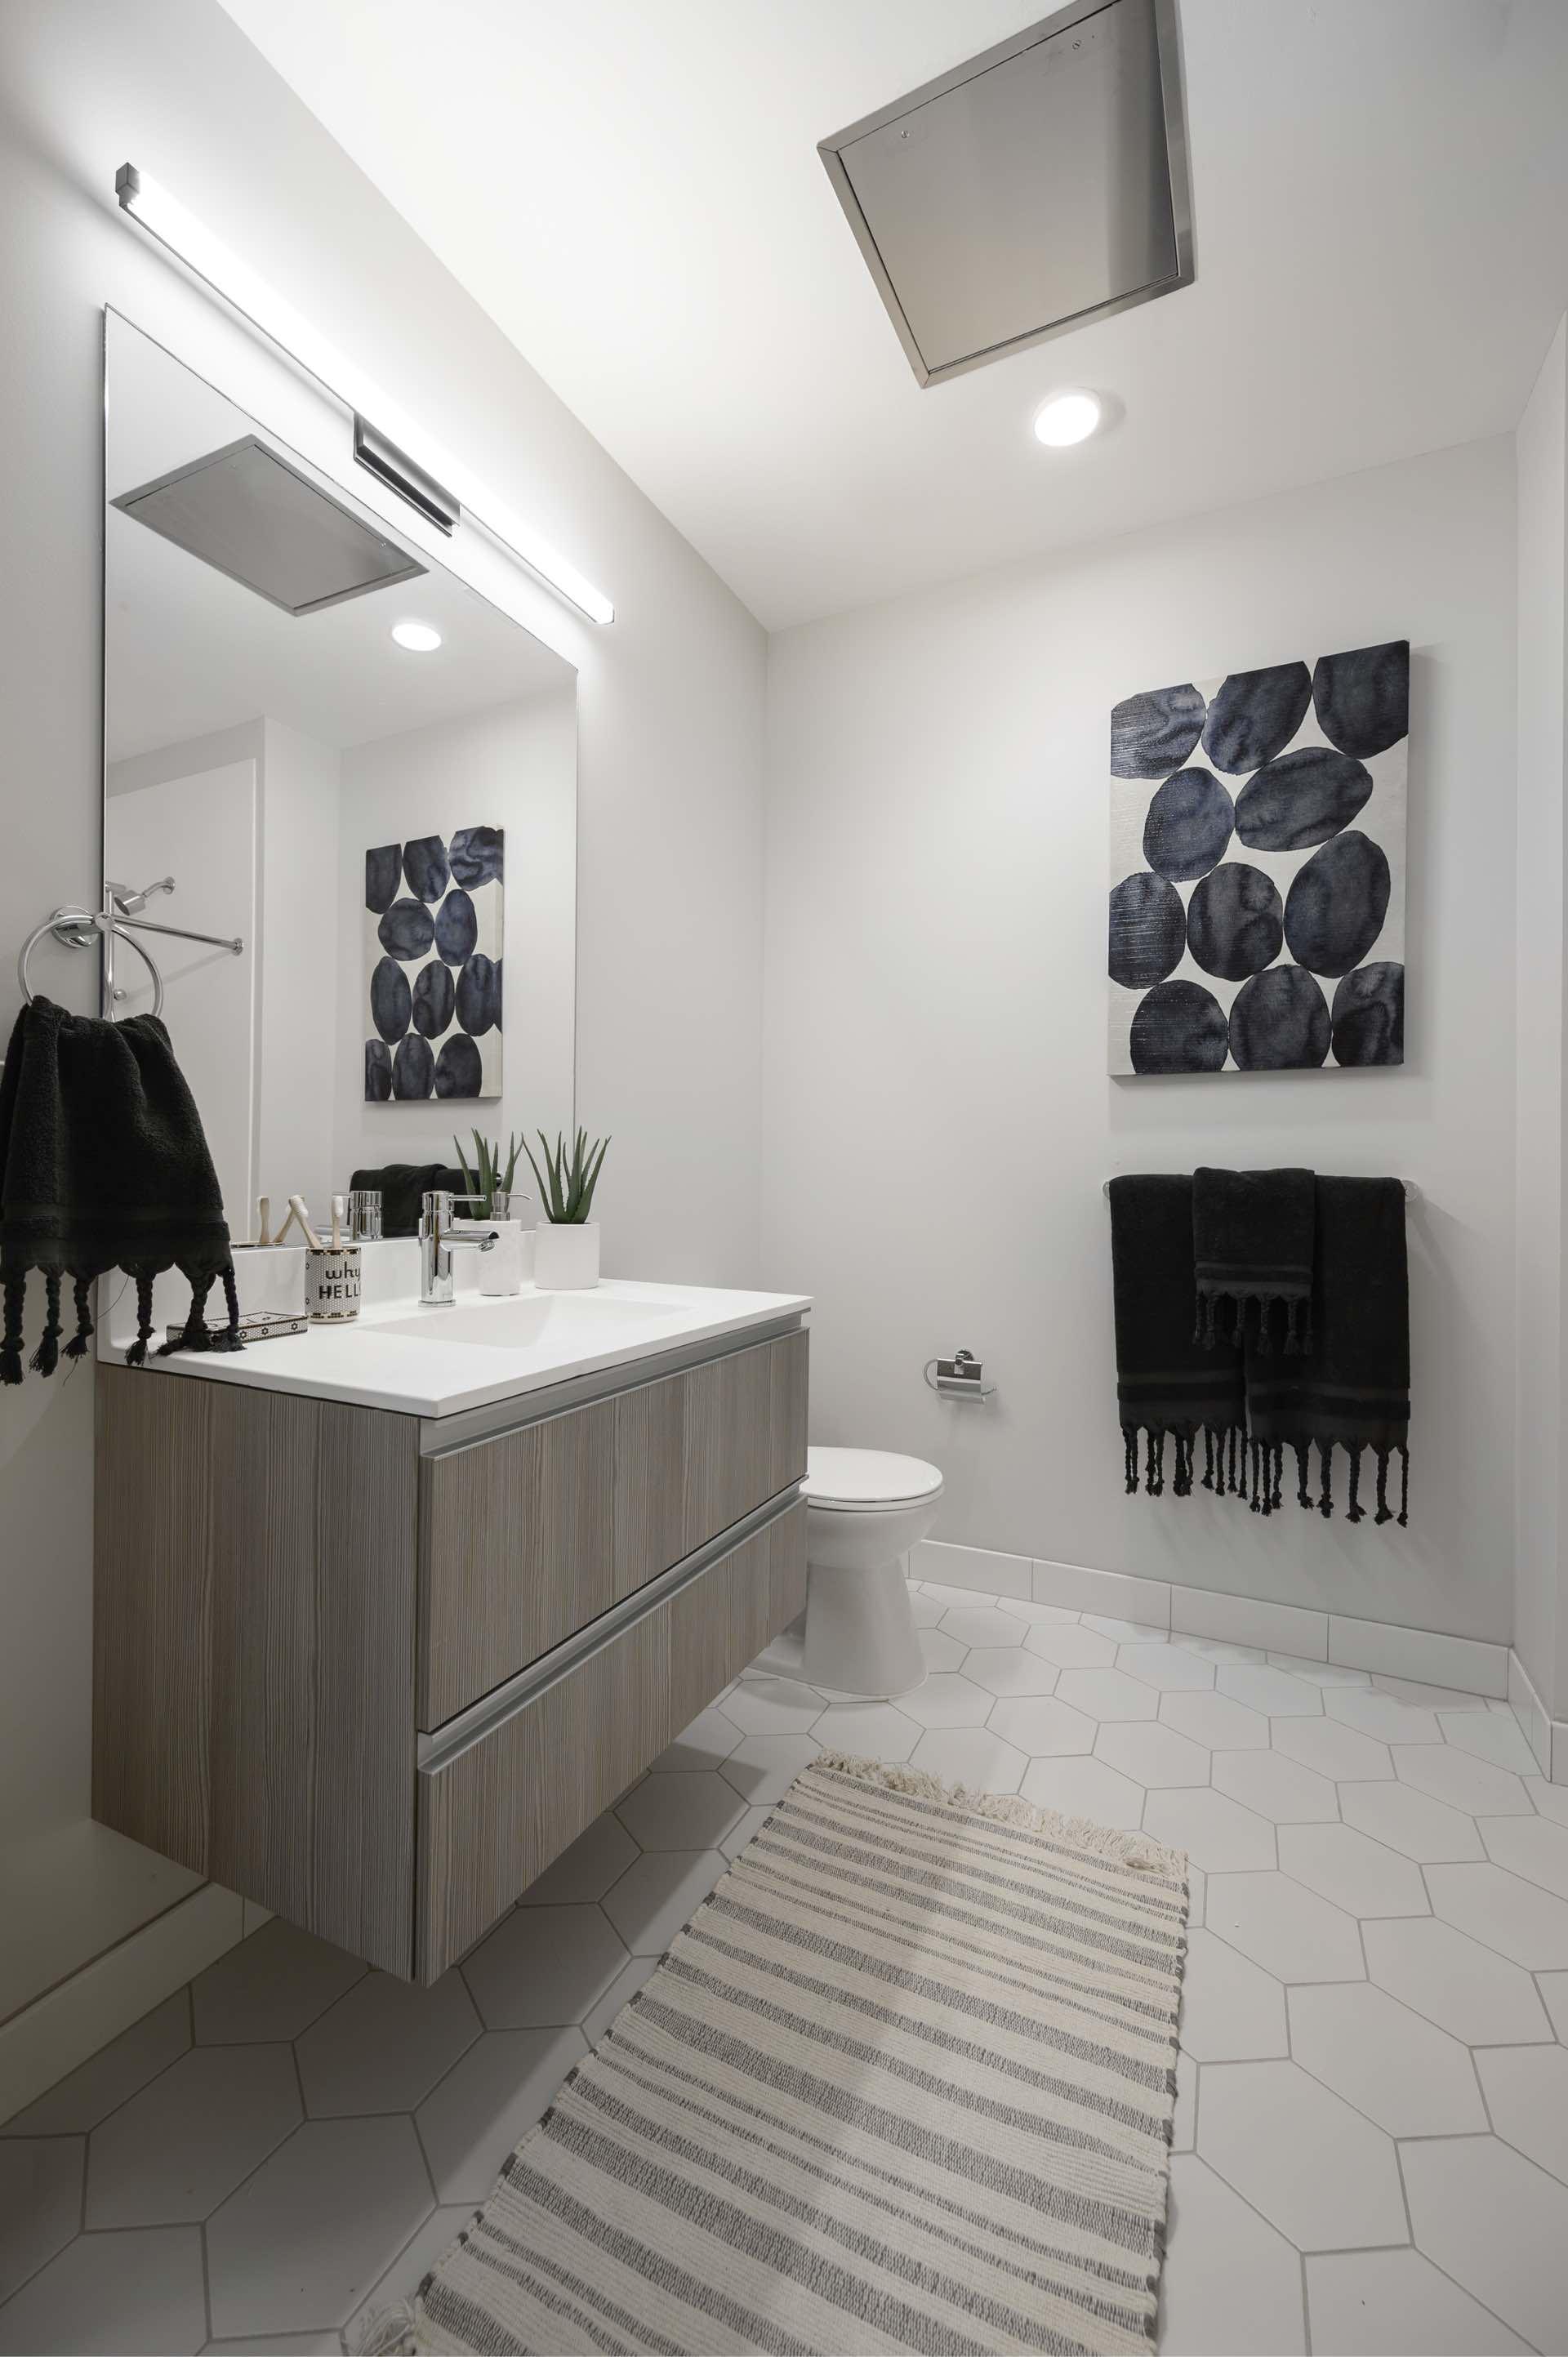 Apartments img 15